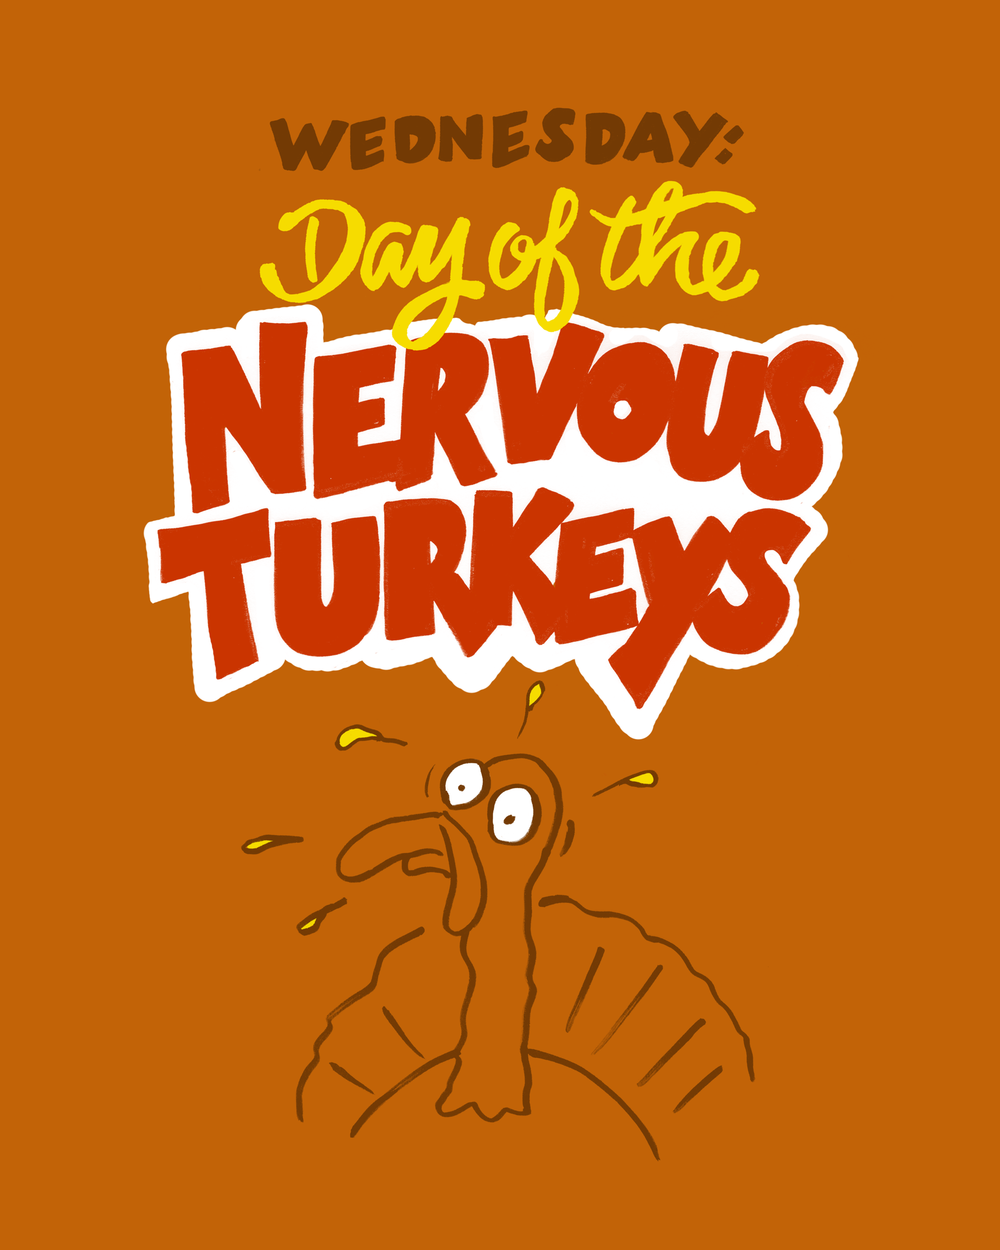 wednesday day of the nervous turkeys